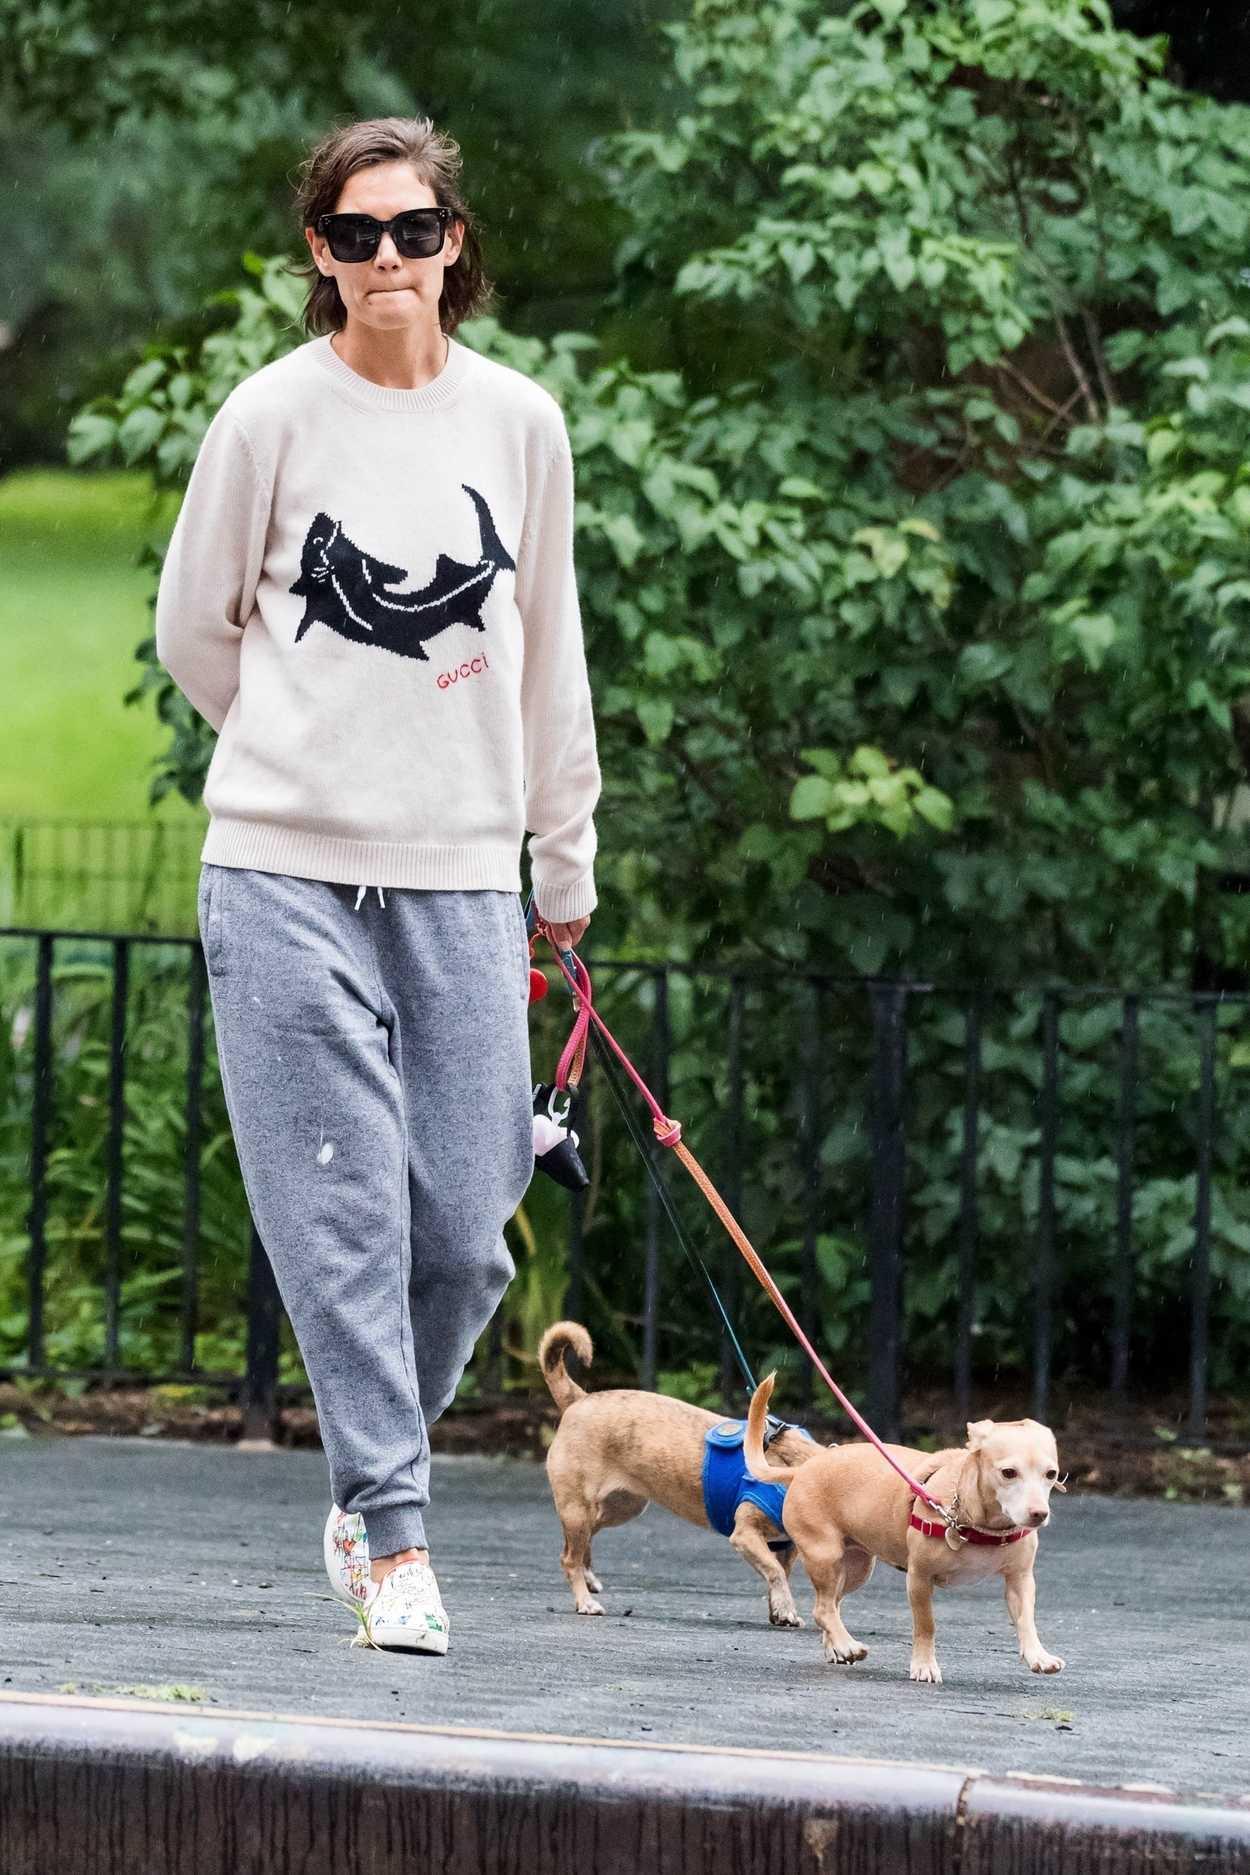 Katie Holmes in a Gucci Sweatshirt